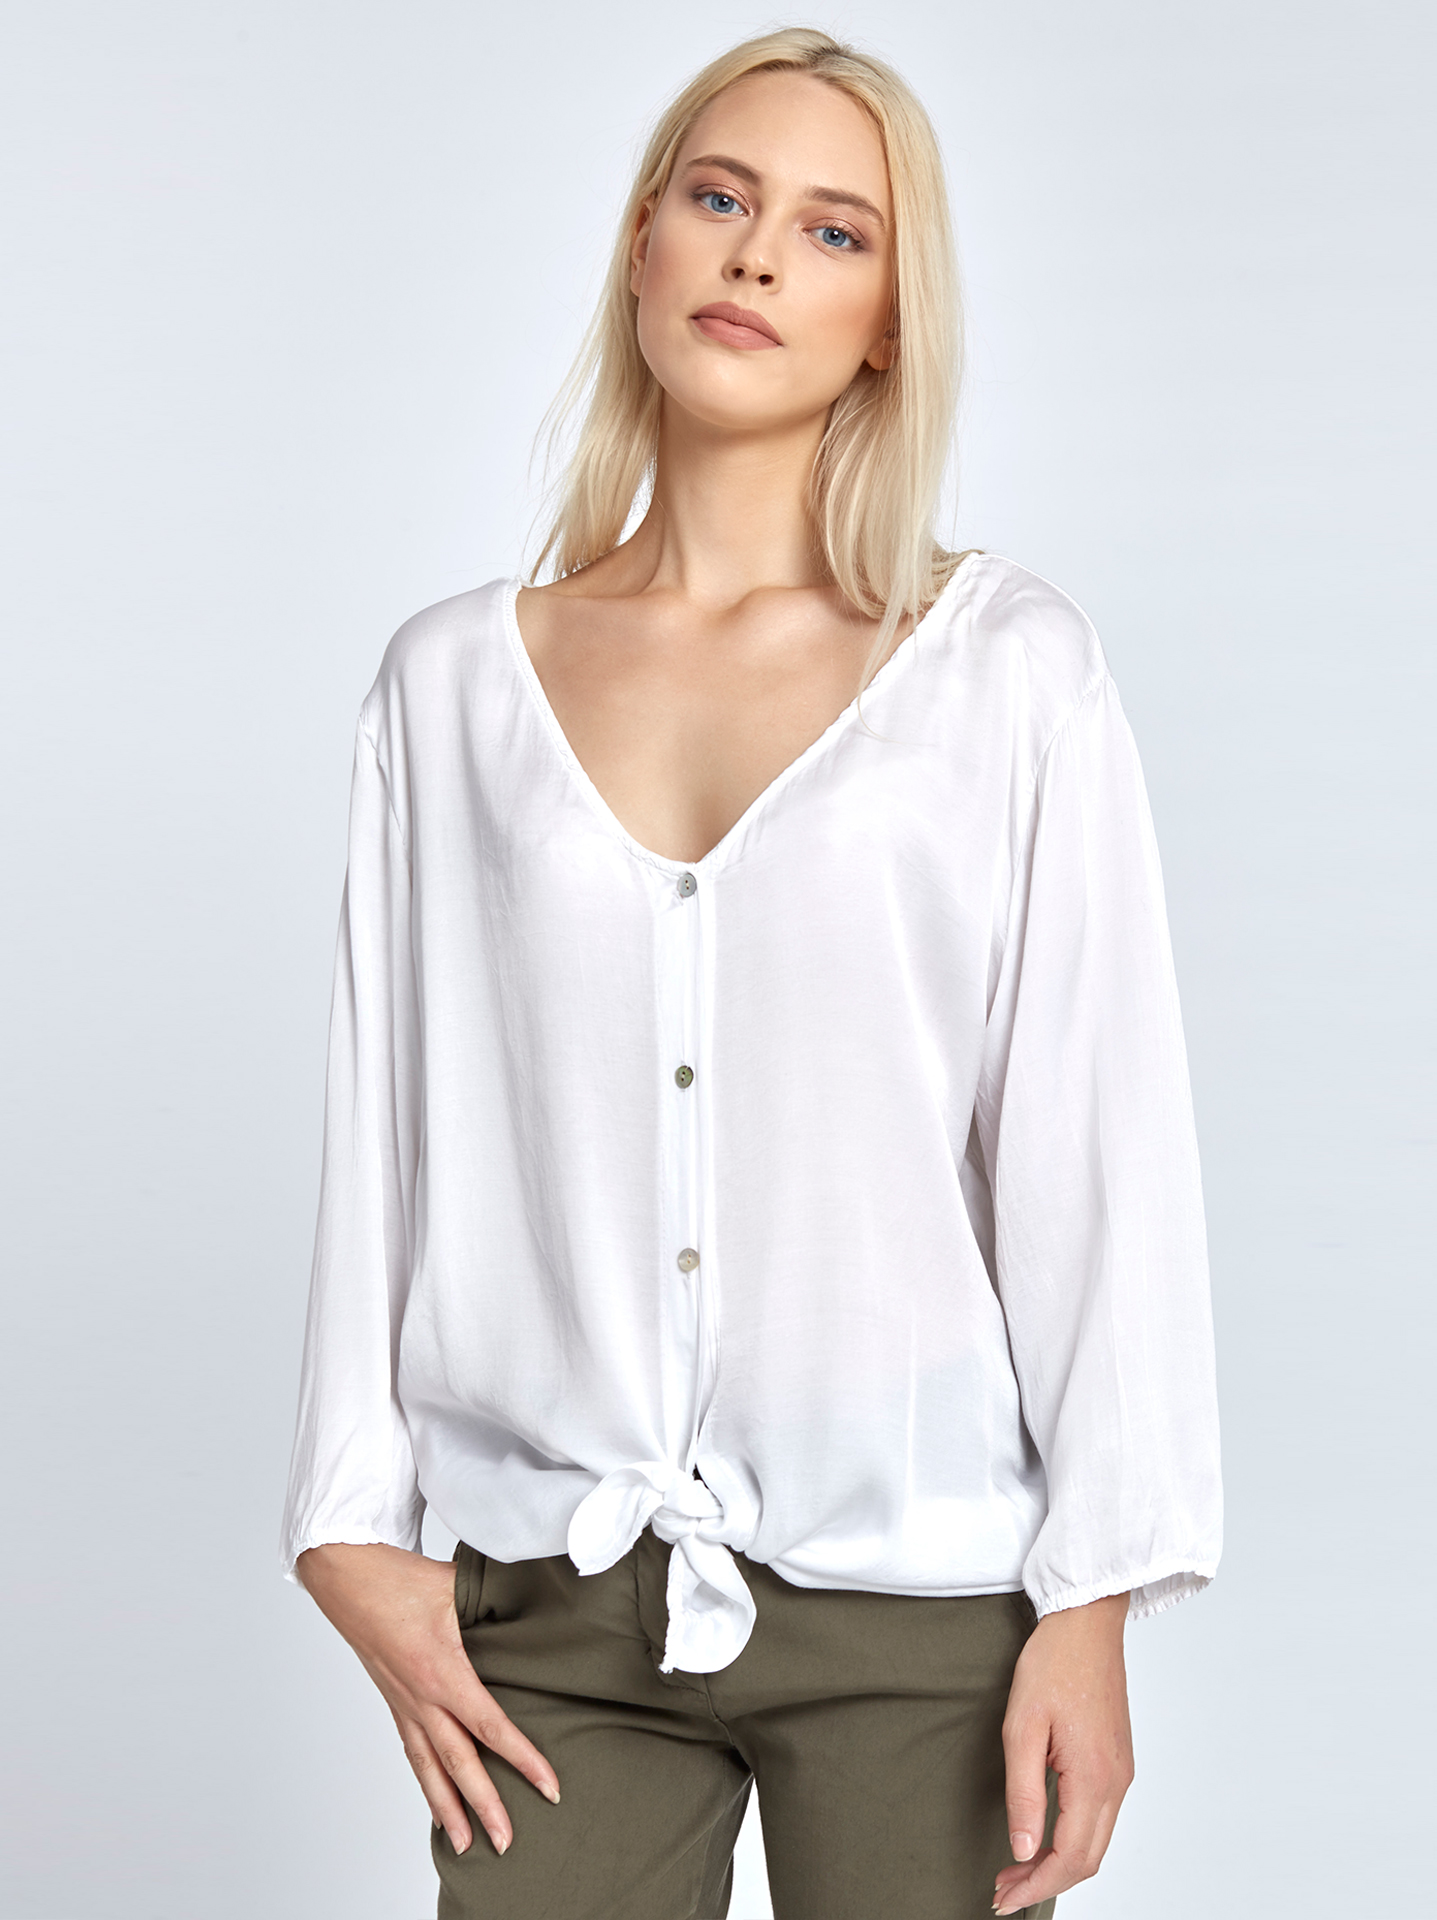 da05e5ce6fe Satin-like tie front shirt in white, 16.95€ | Celestino